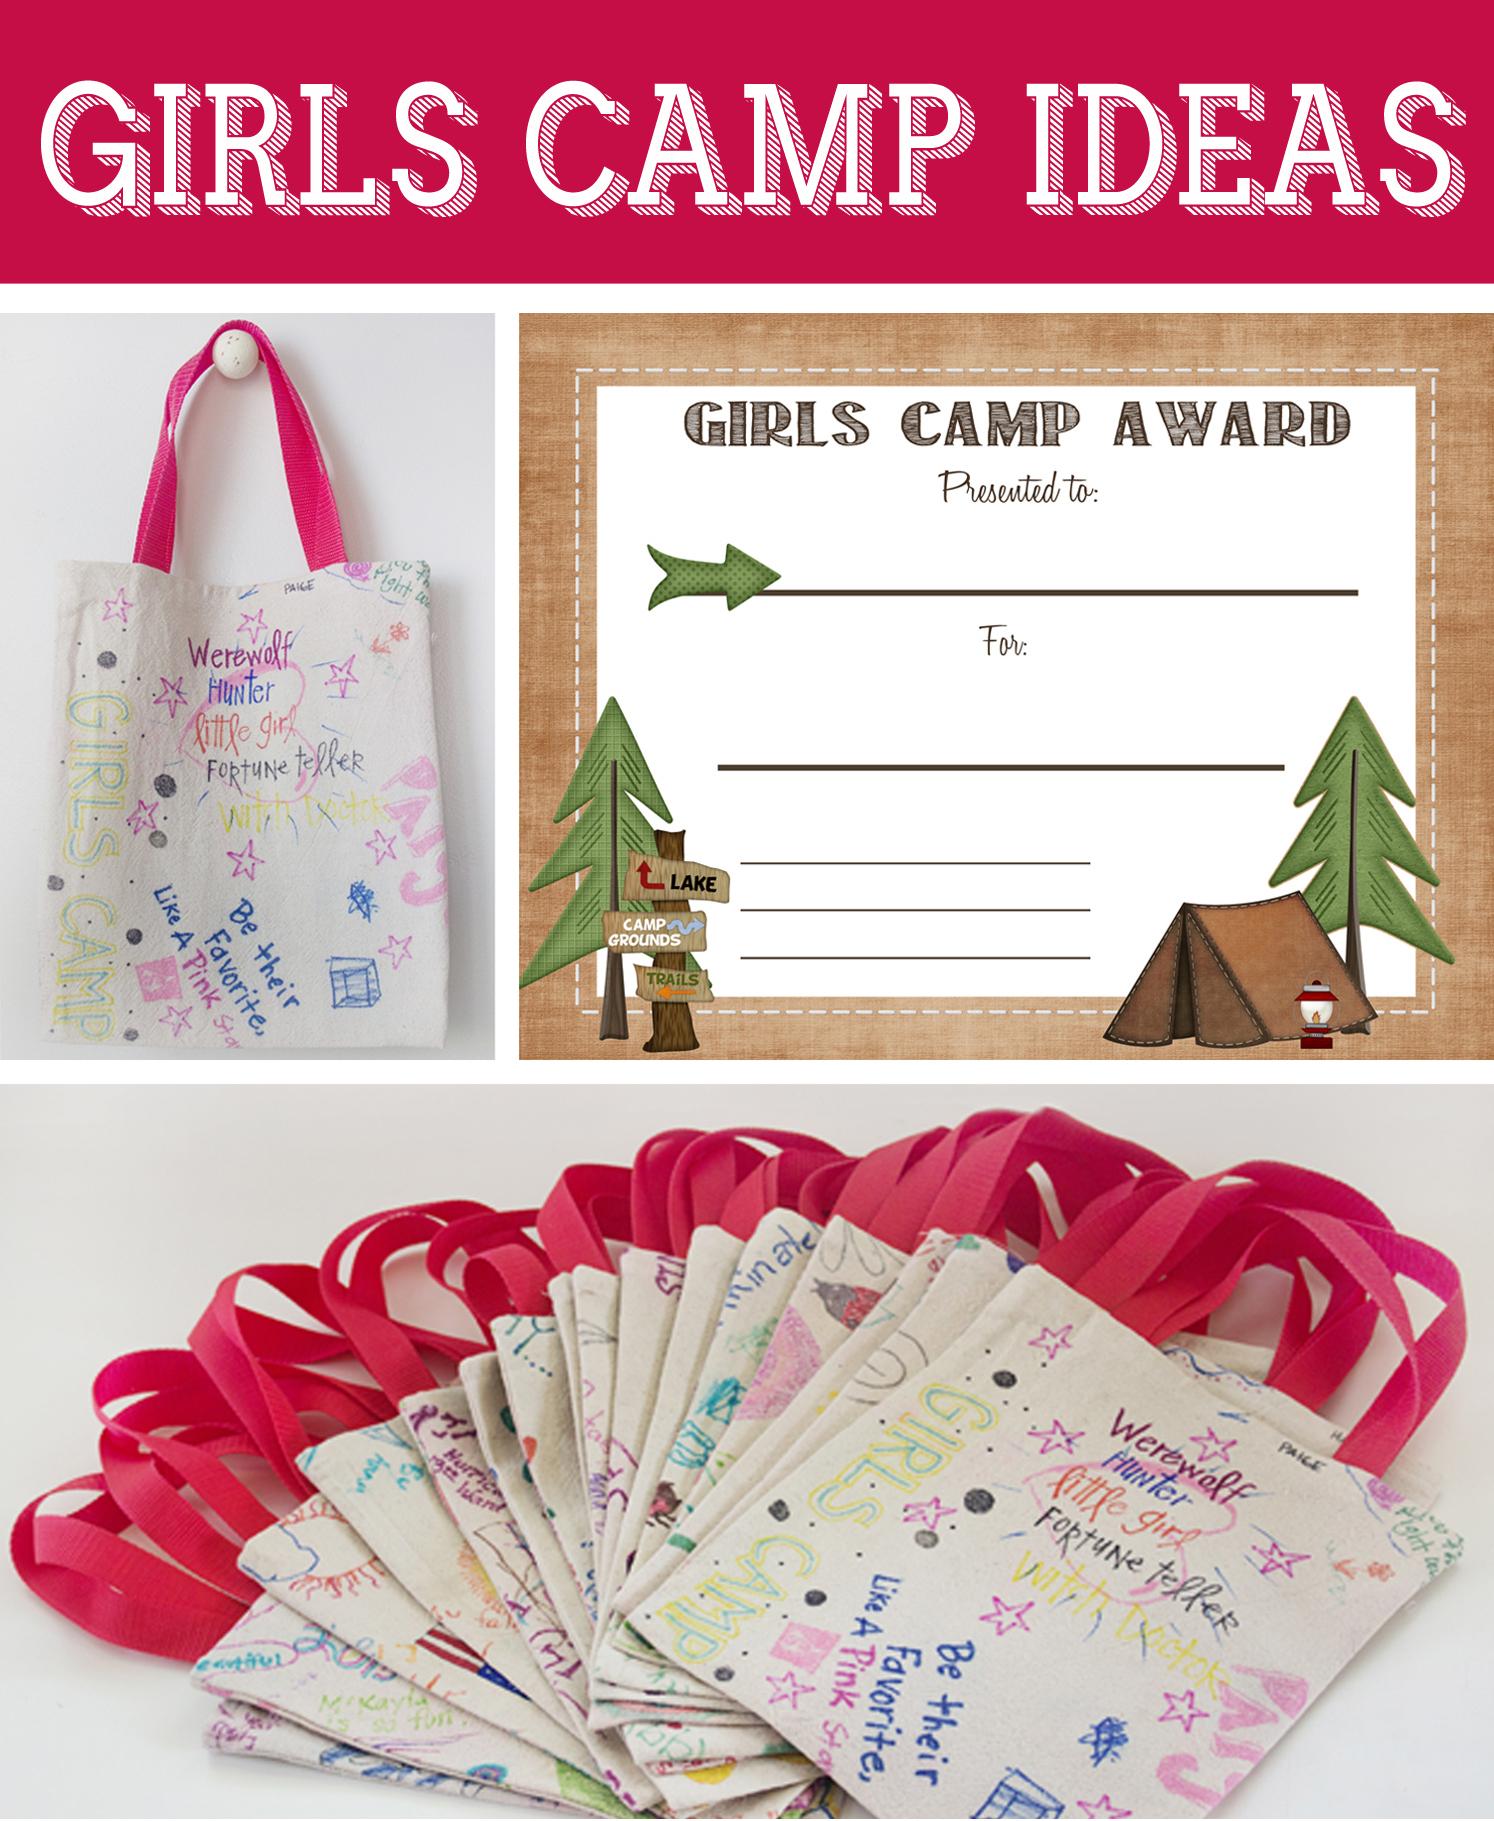 Free Printable Girls Camp Award Certificate - Free Printable Camp Certificates